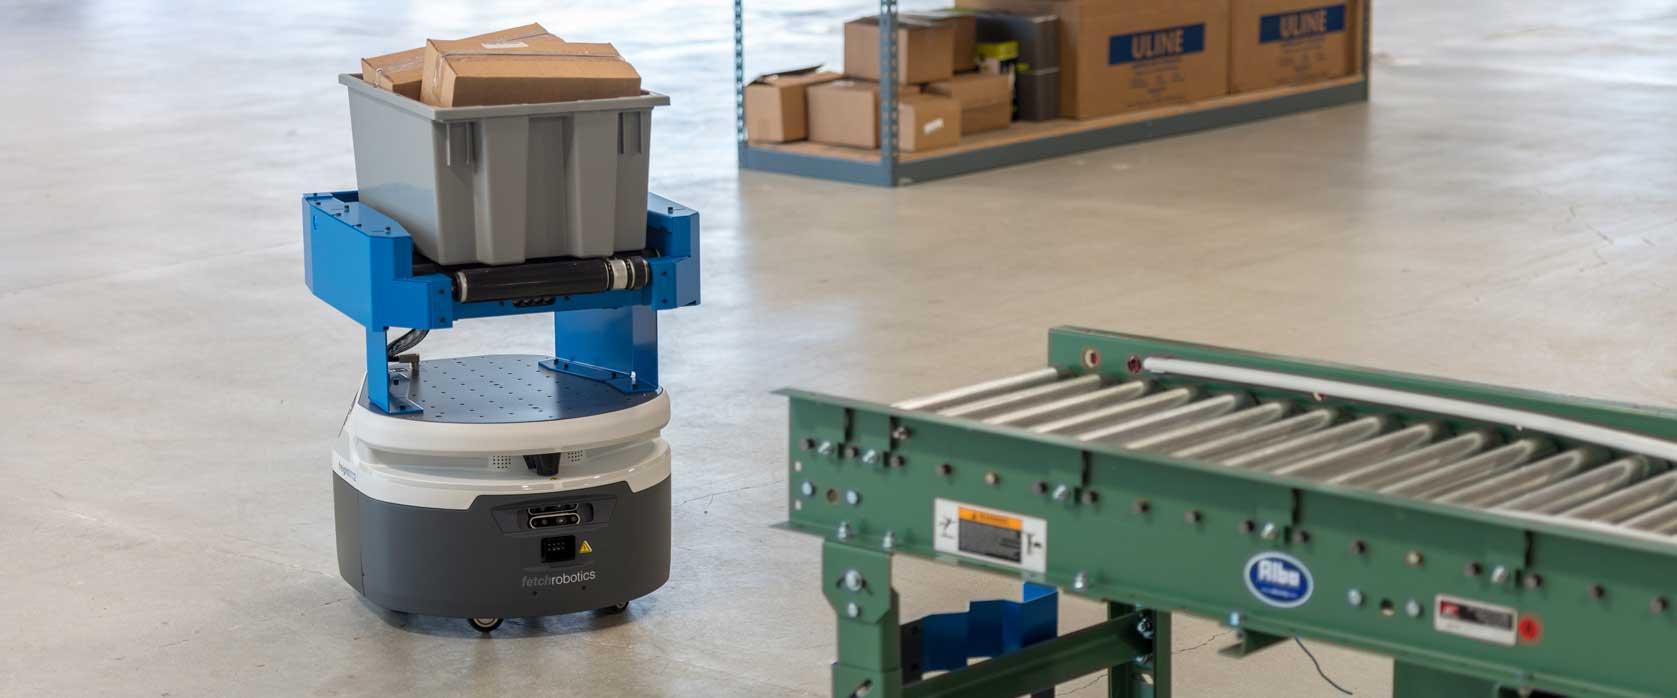 Fetch Robotics RollerTop